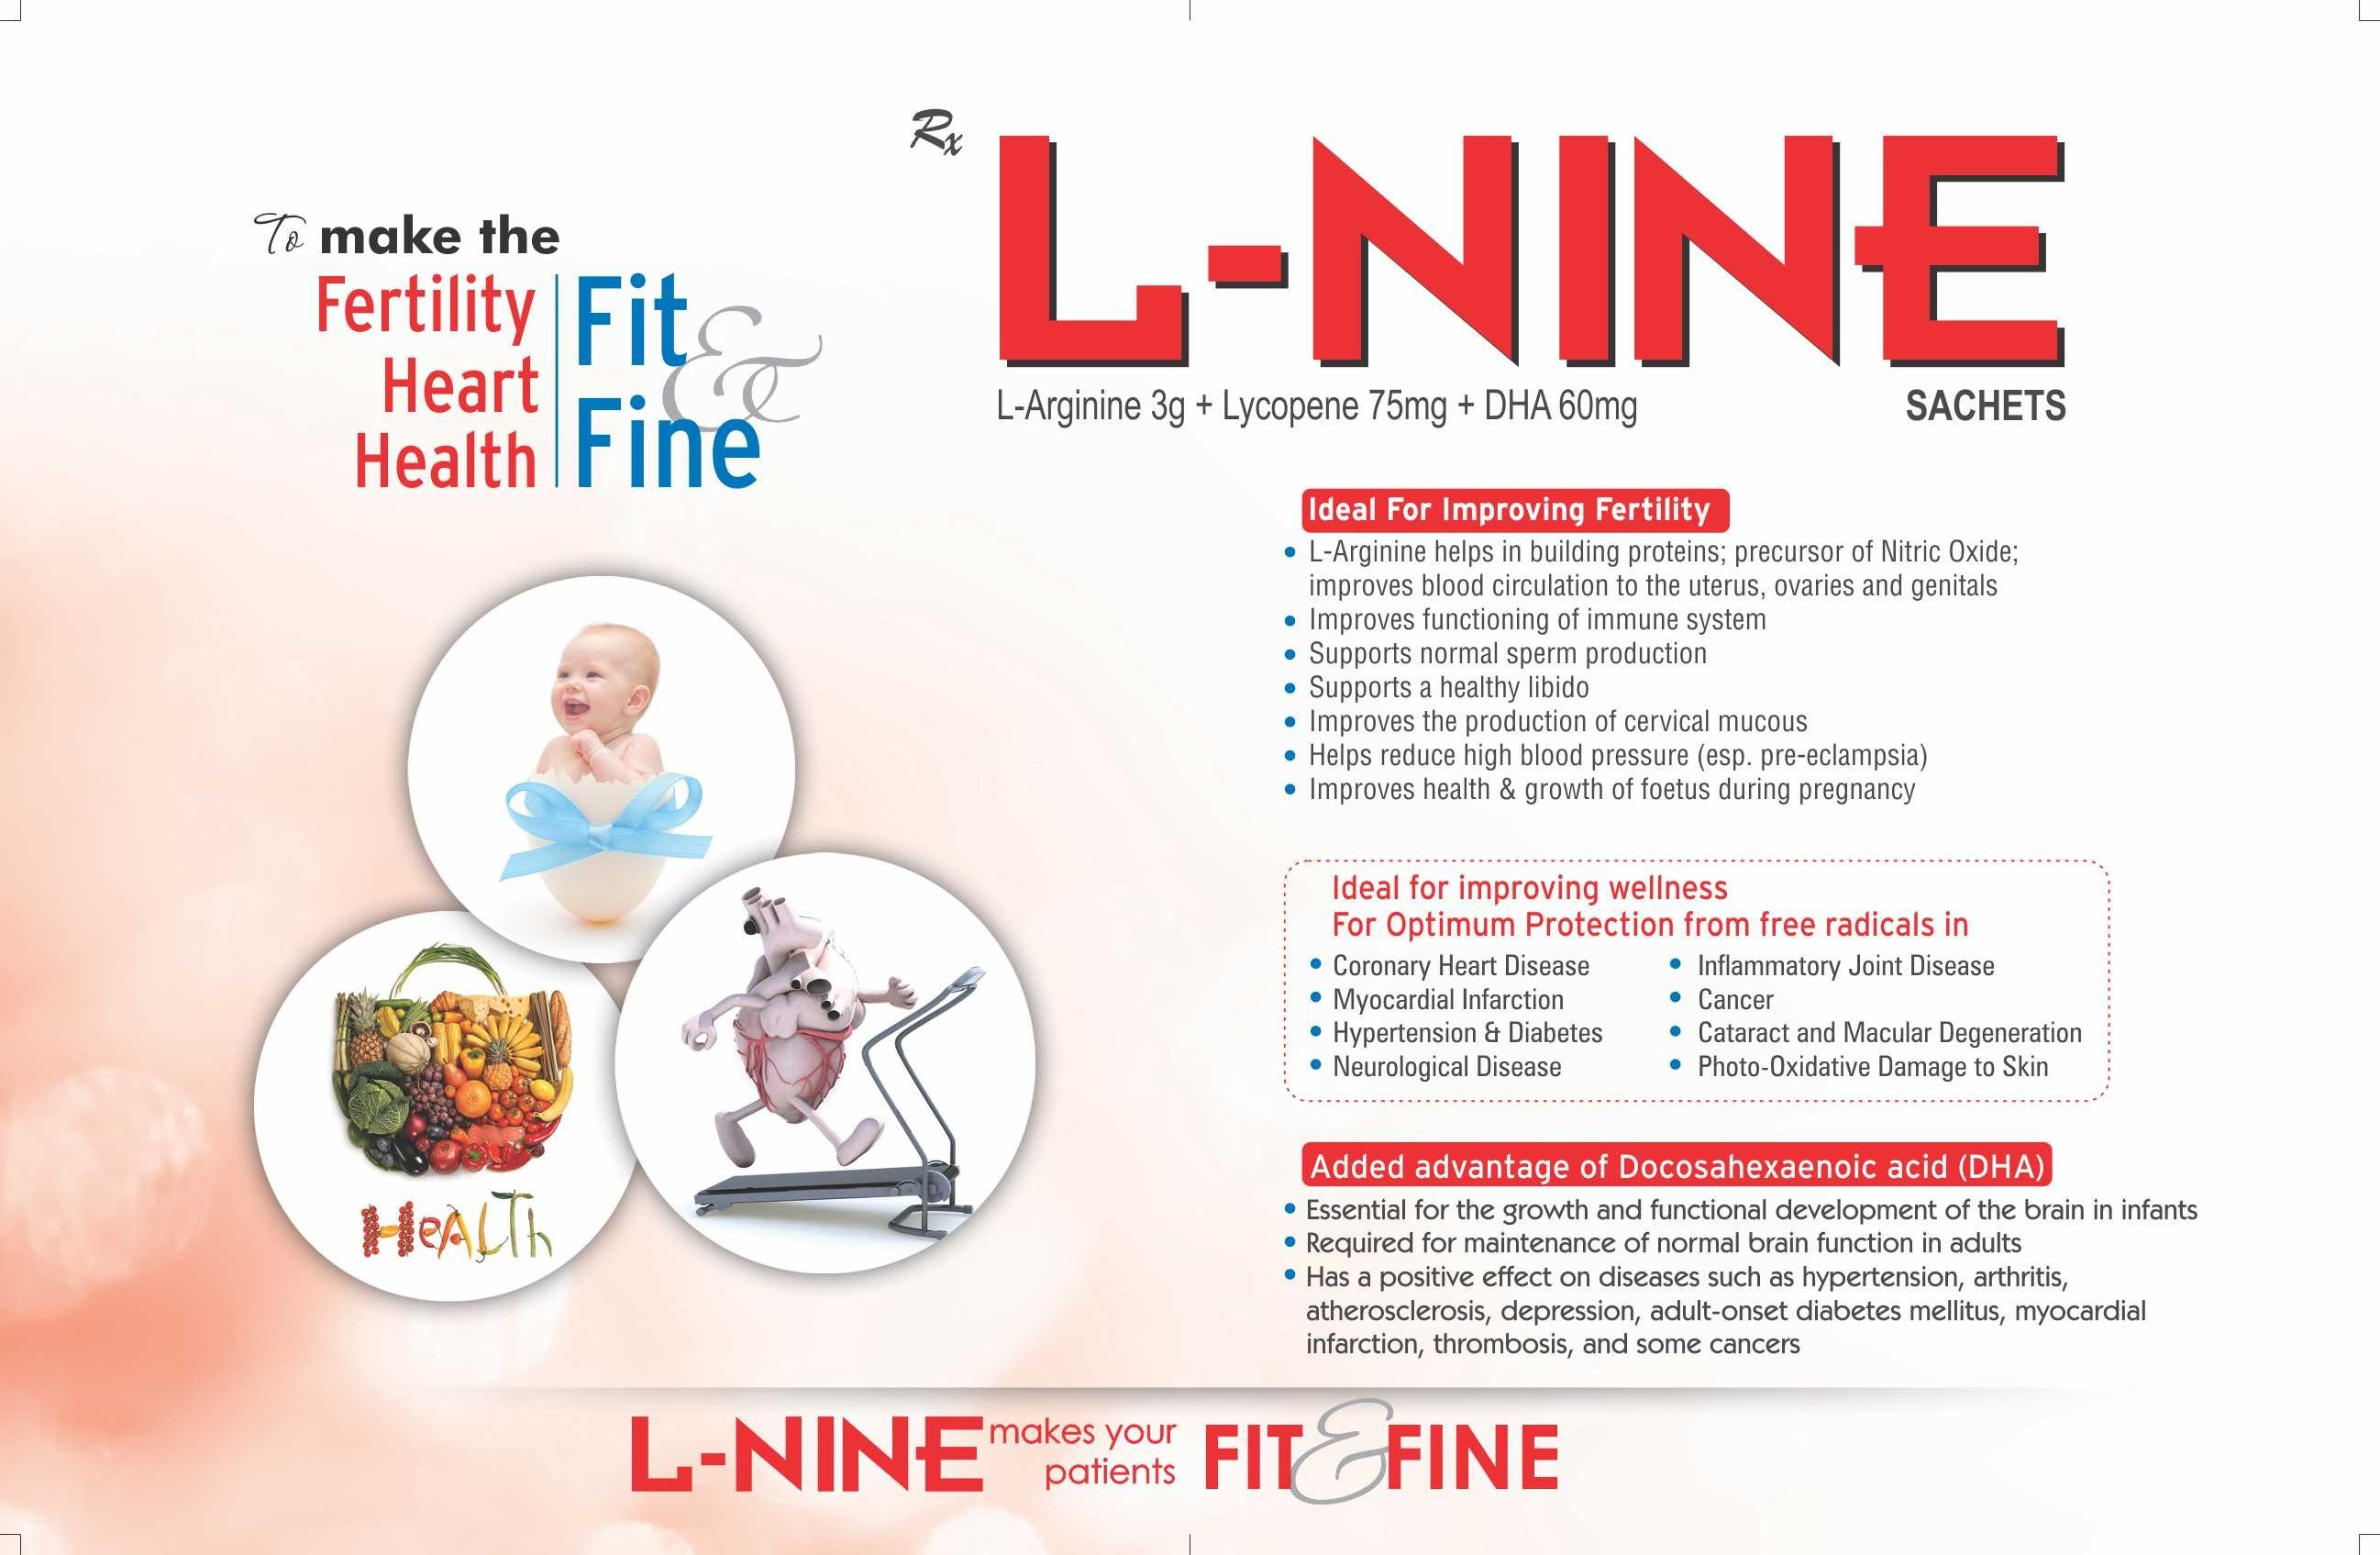 L-Nine